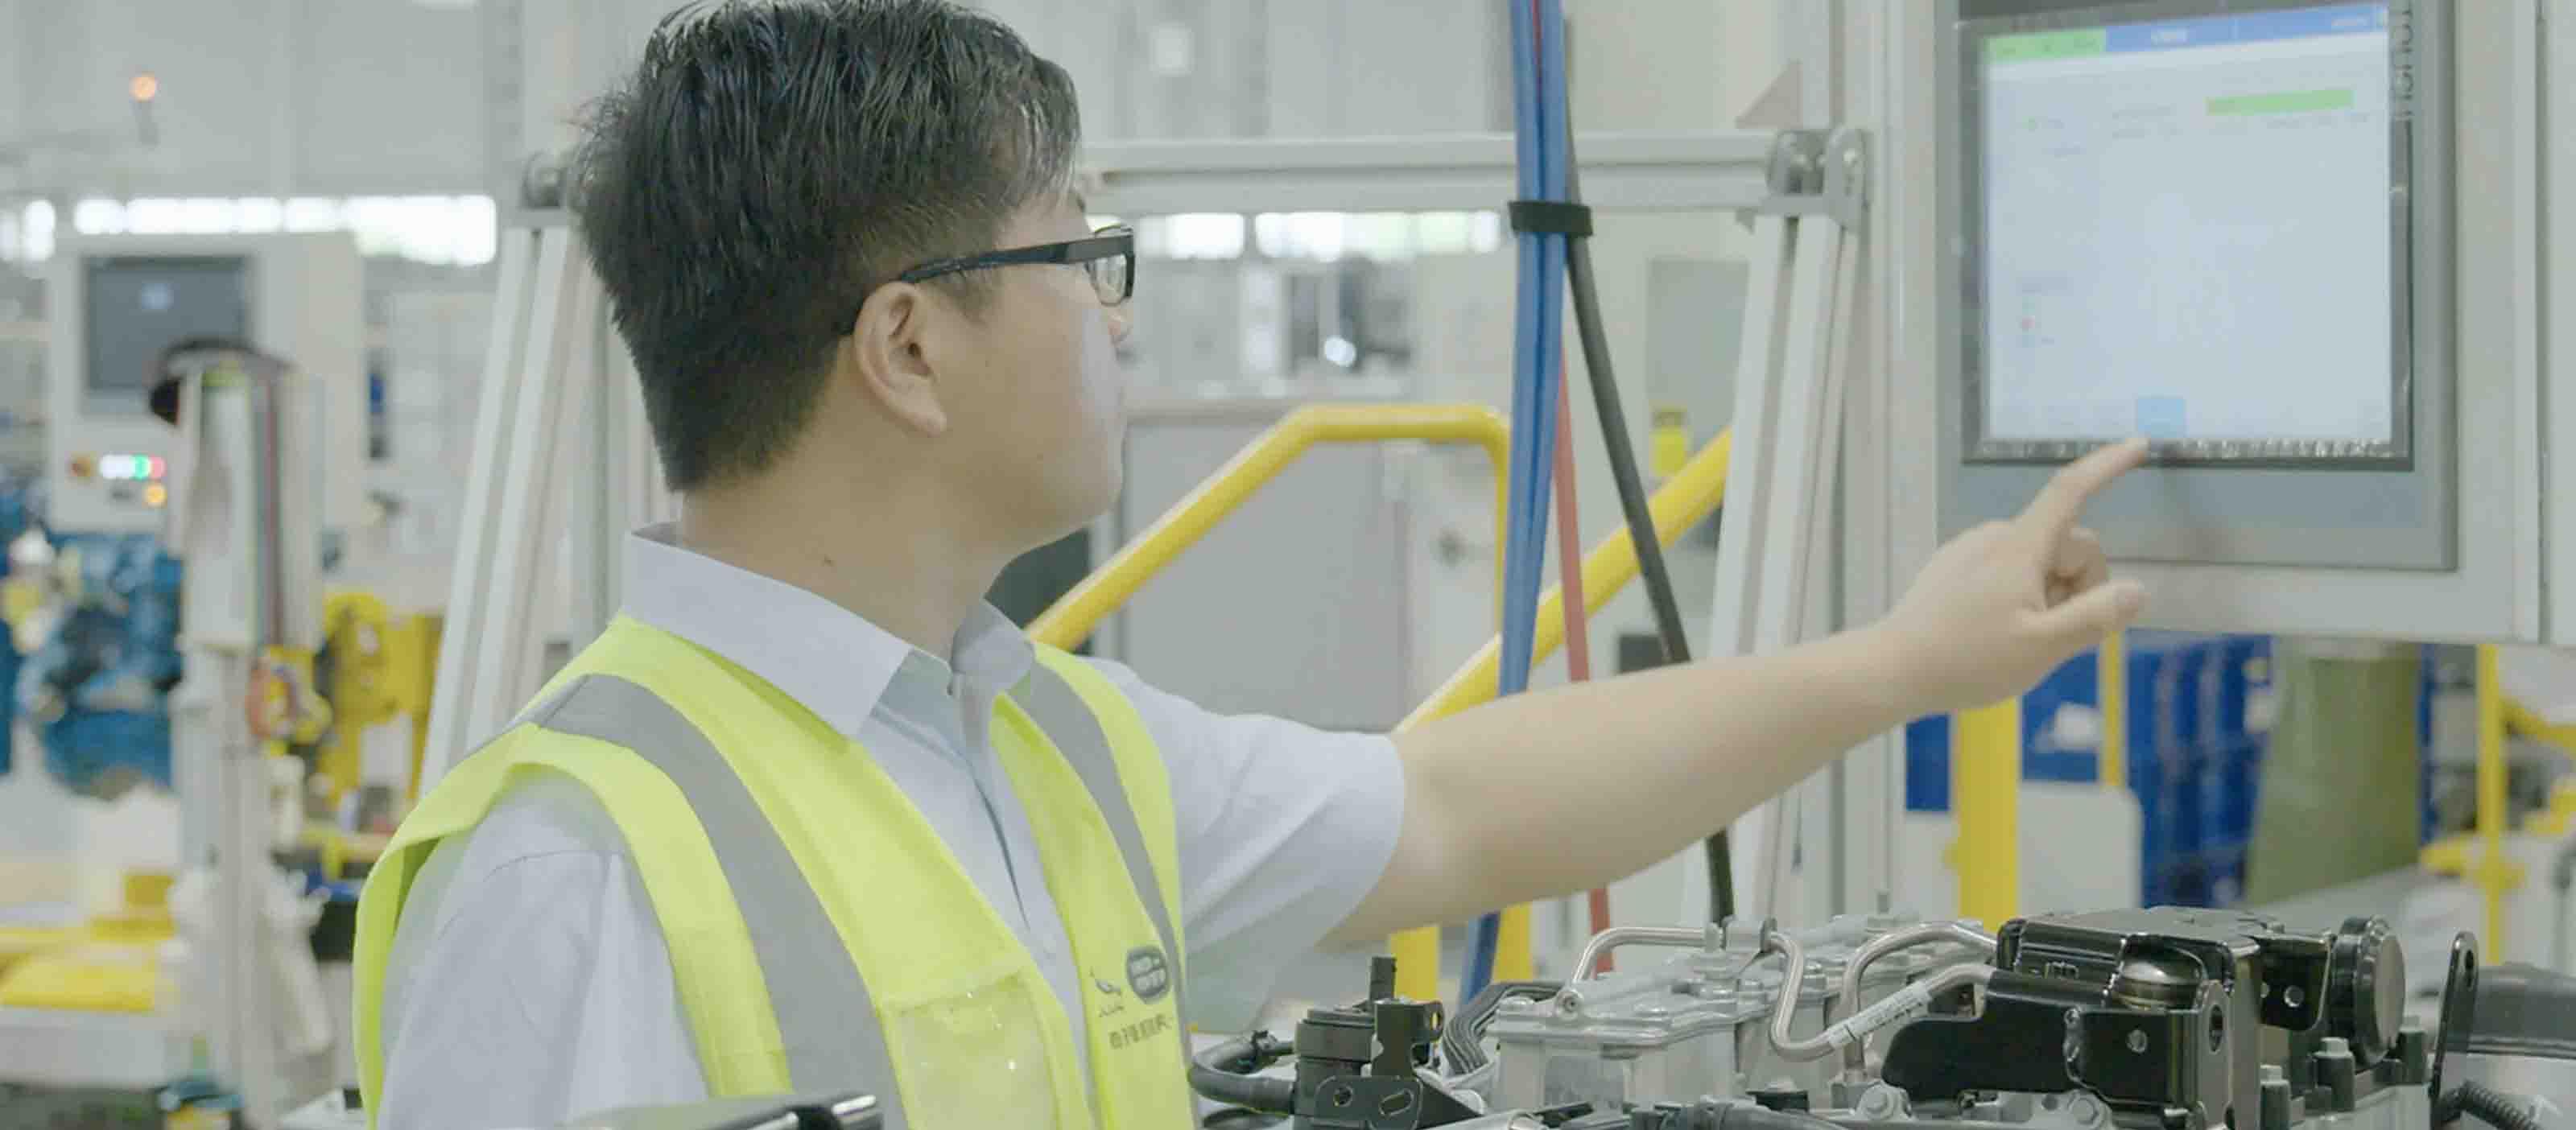 Industrial manufacturing operator using GE Digital MES software